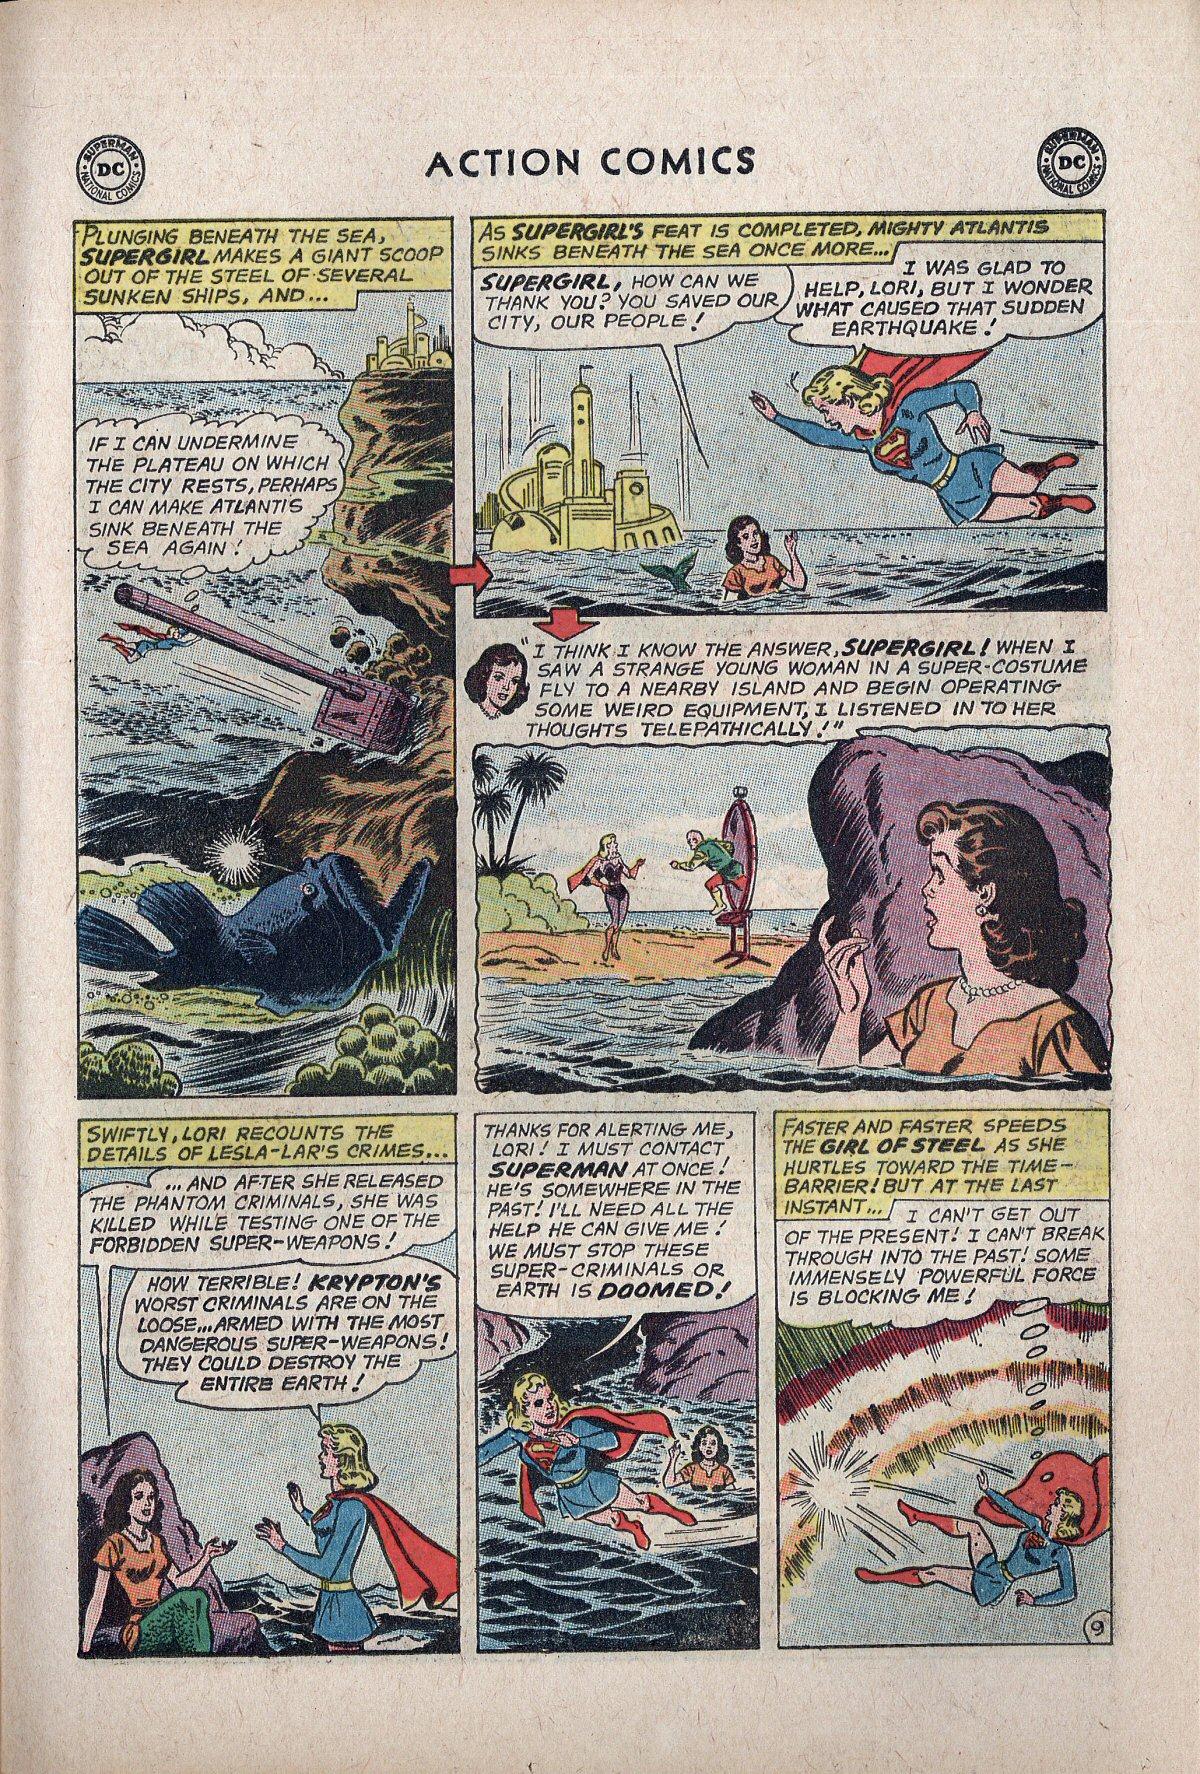 Action Comics (1938) 297 Page 26